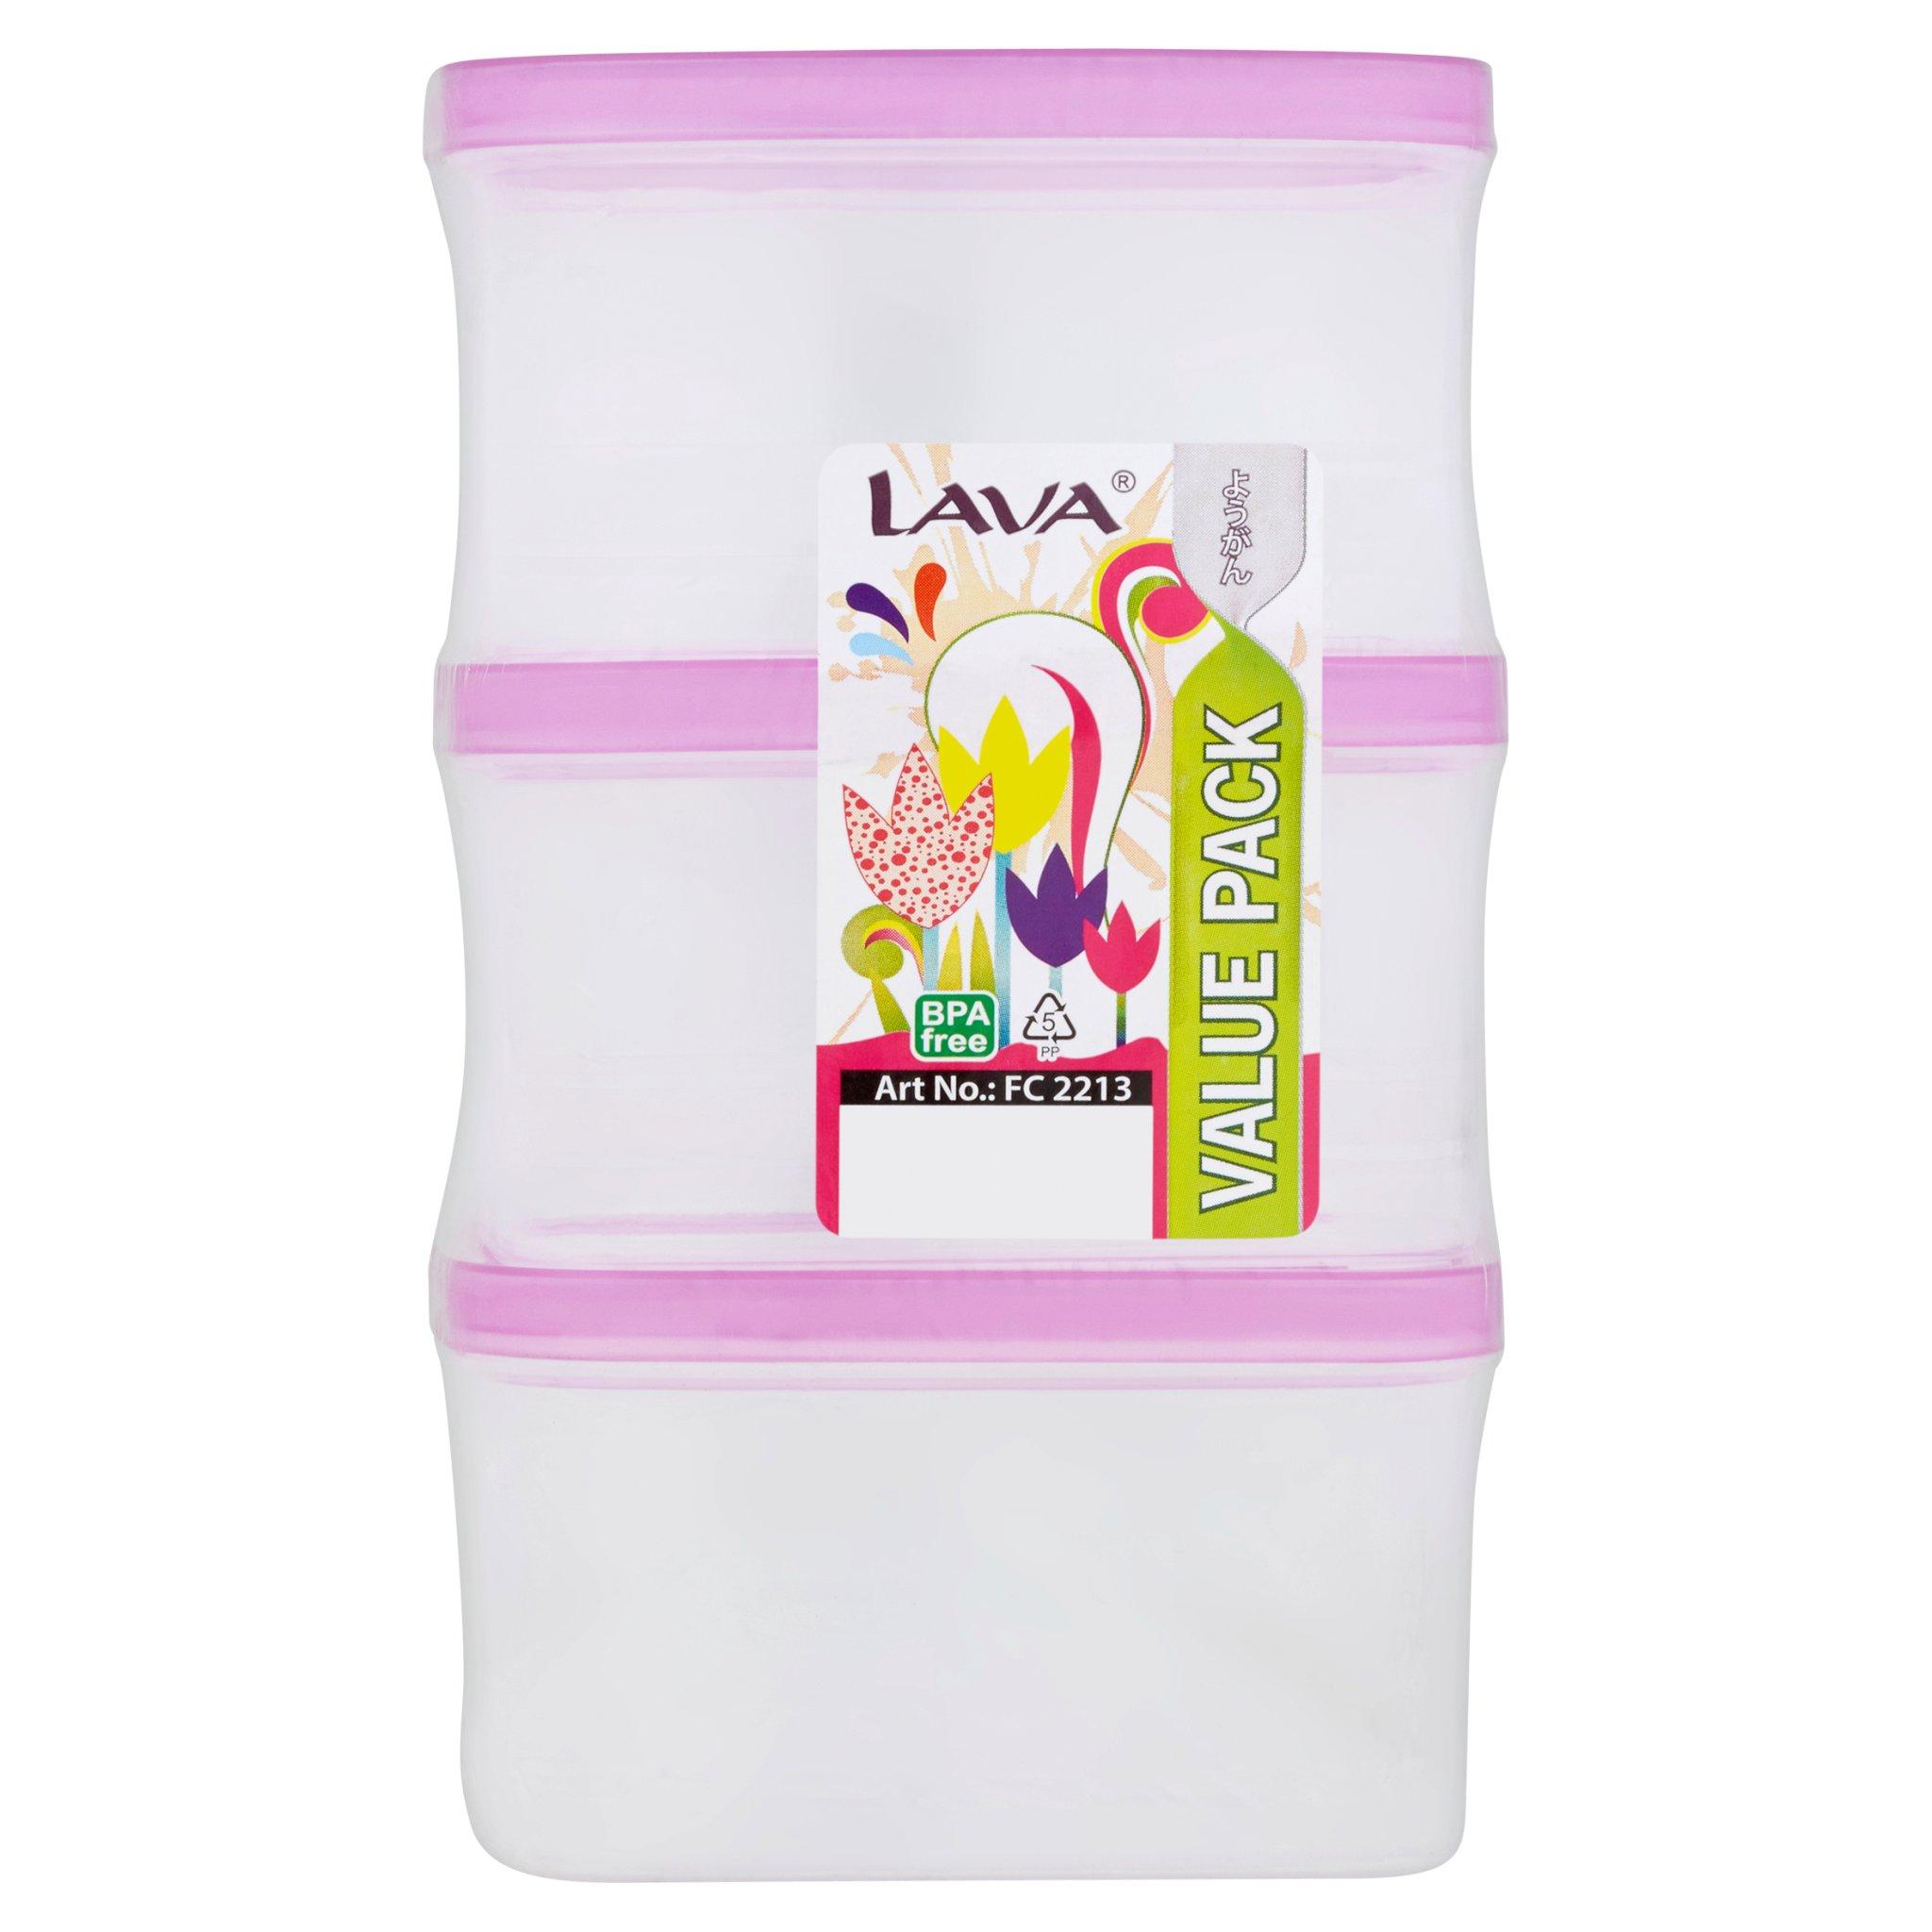 Lava Food Container FC2213